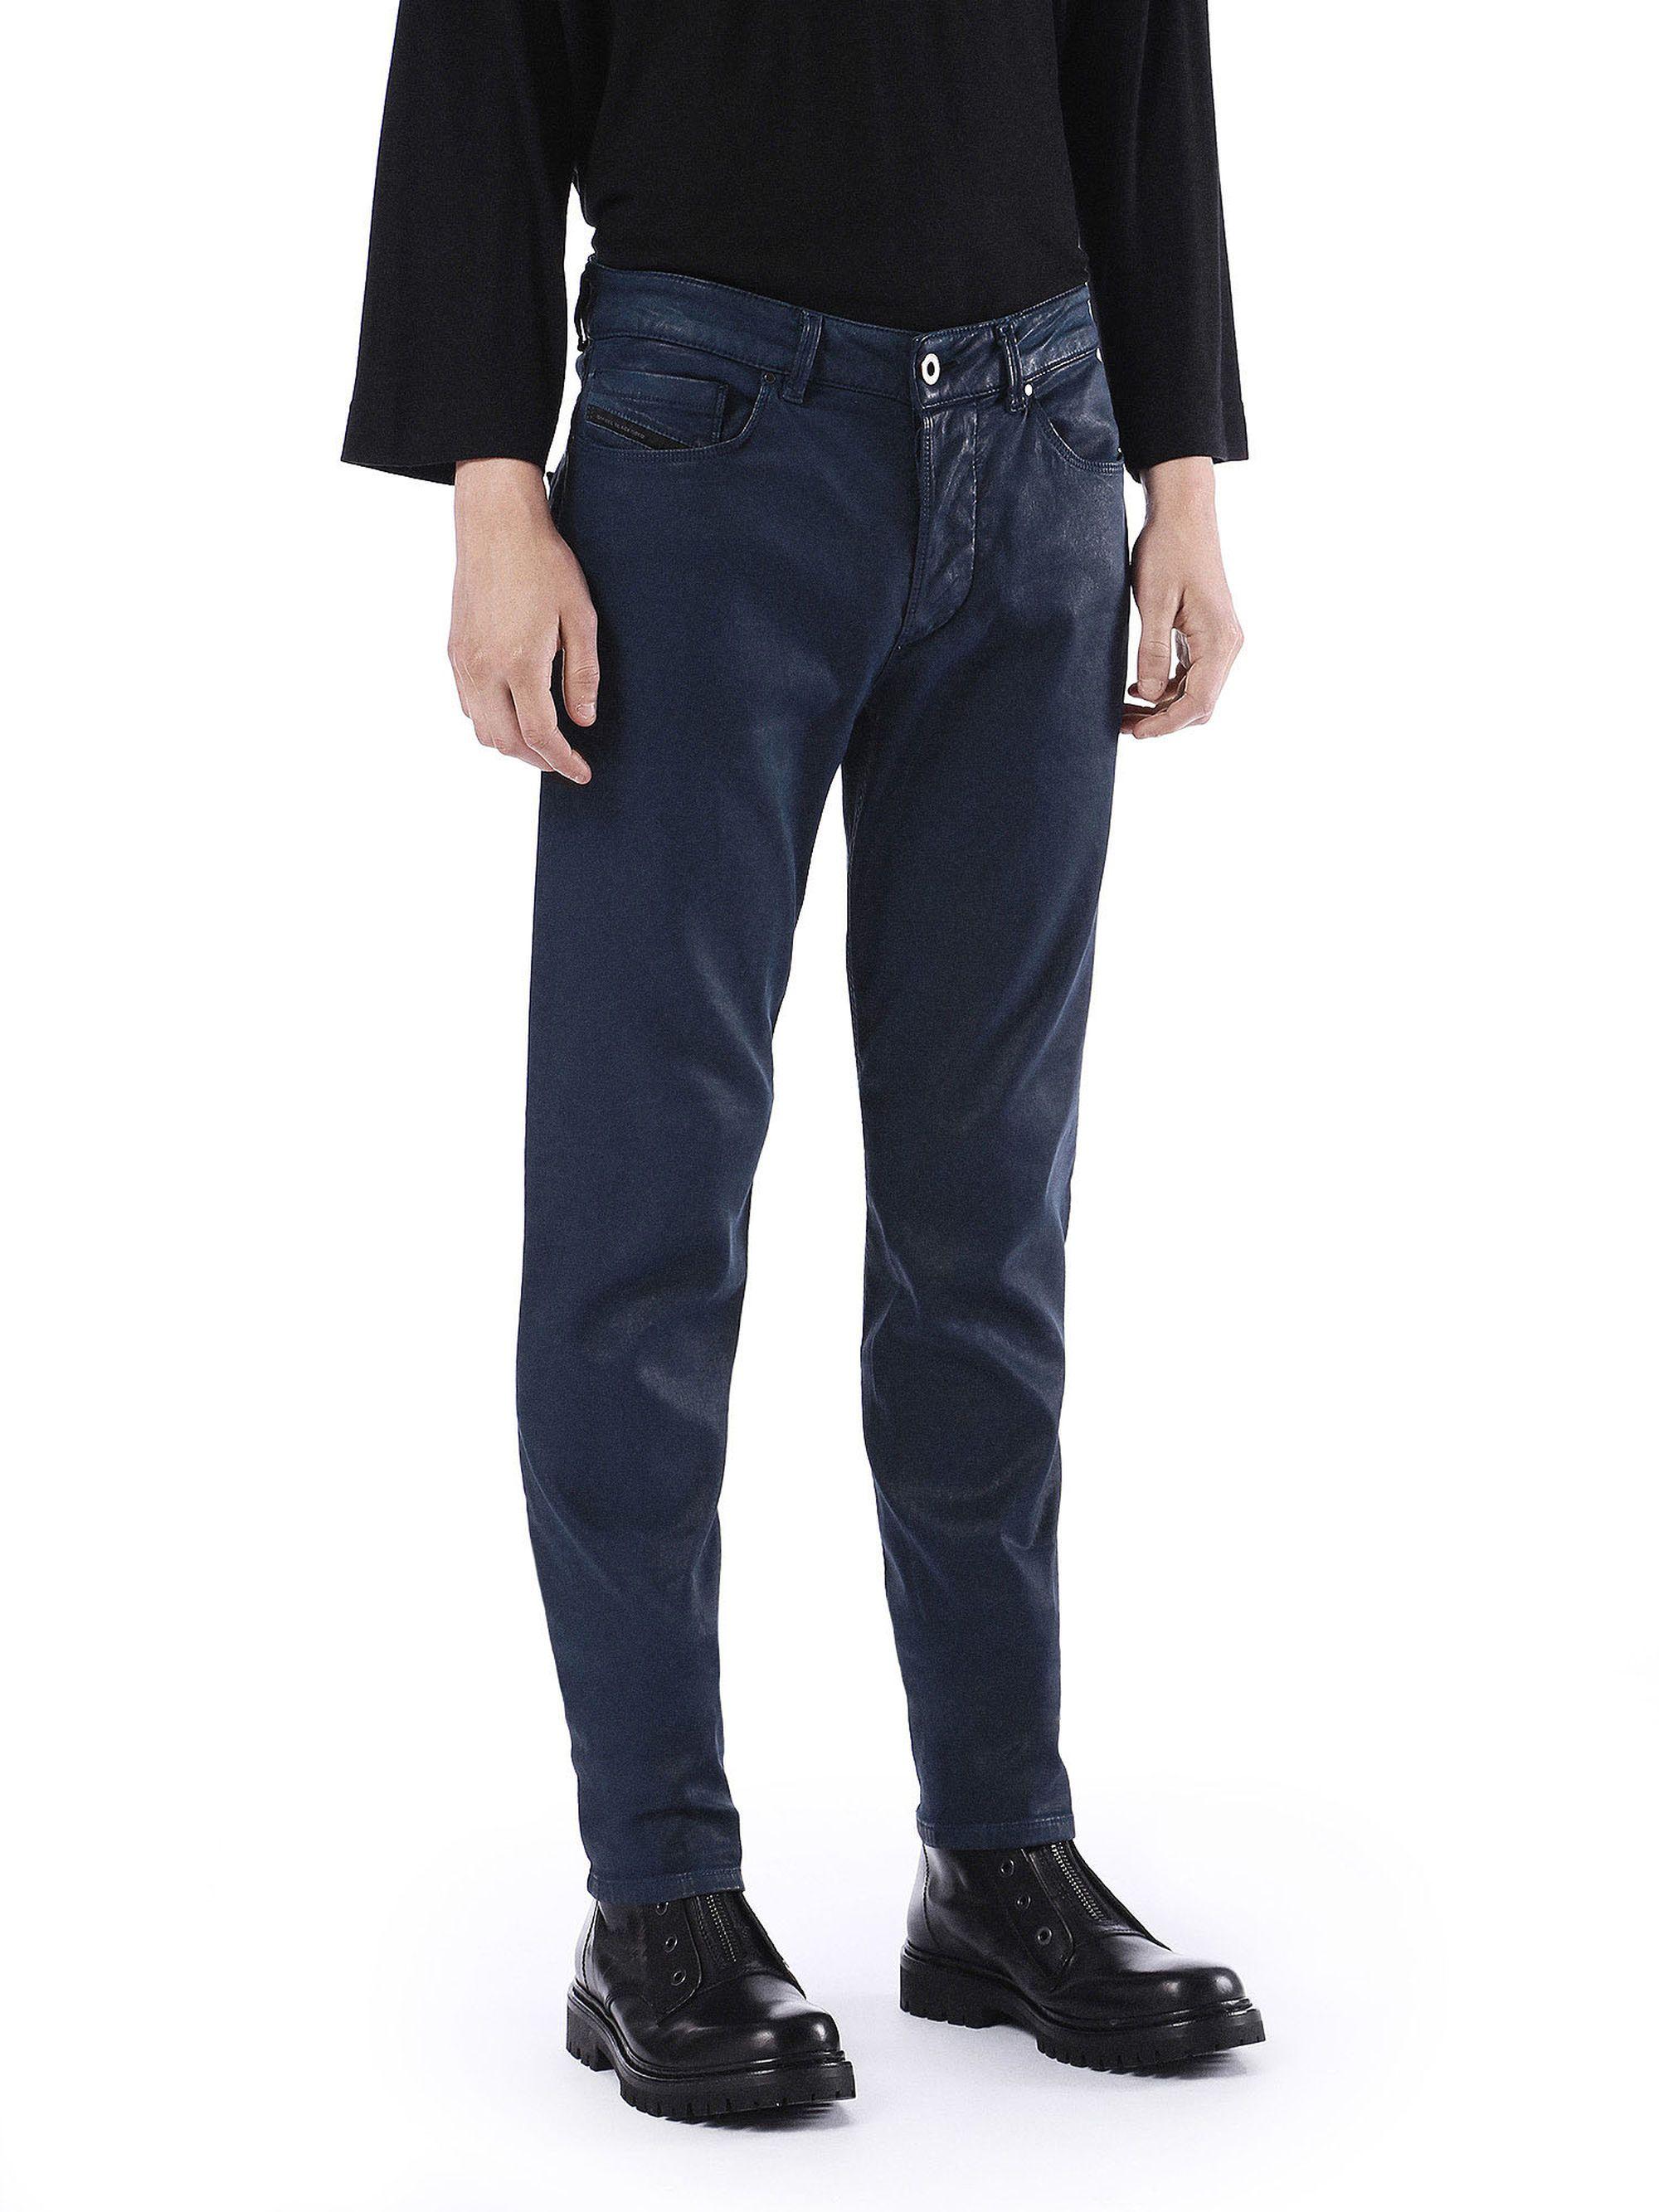 b1dc9c7f Diesel Black Gold TYPE-247 Skinny Fit Stretch Fleece-Knit Denim Jeans in Dark  Blue from the Diesel Online Store #DieselOnlineStore #DieselBlackGold  #TYPE247